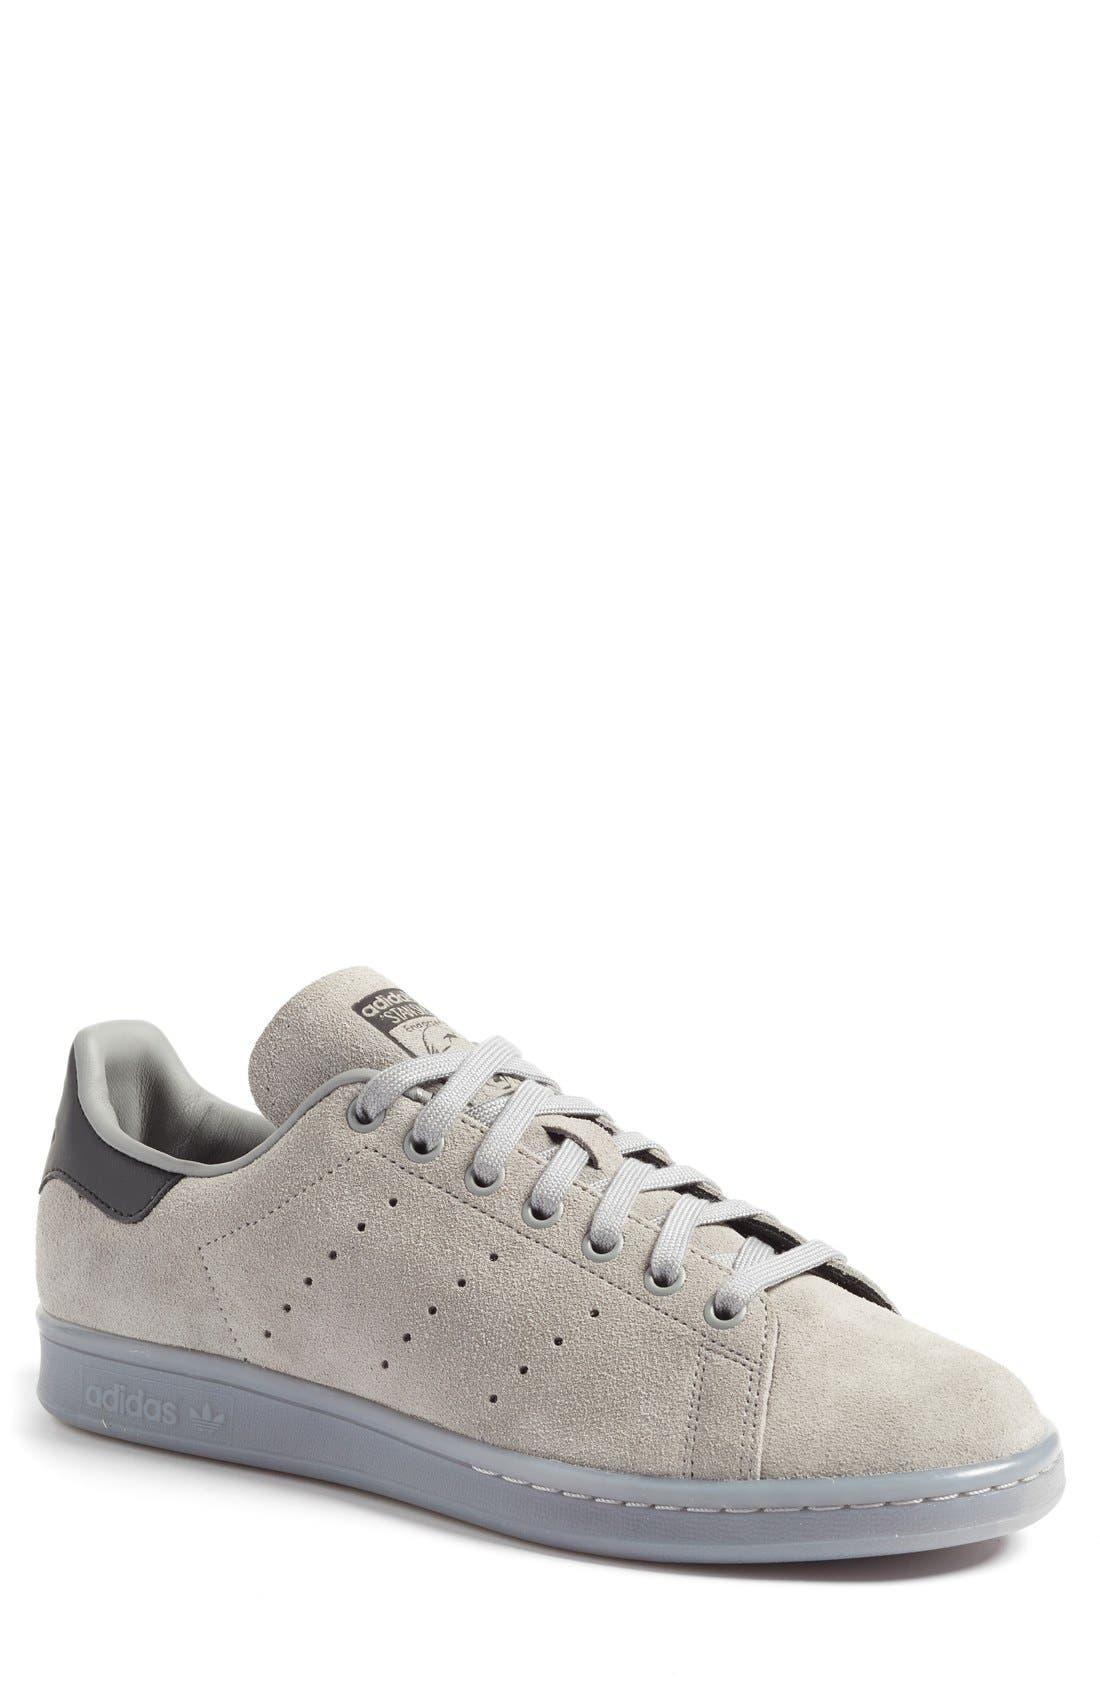 Main Image - adidas 'Stan Smith' Sneaker (Men)